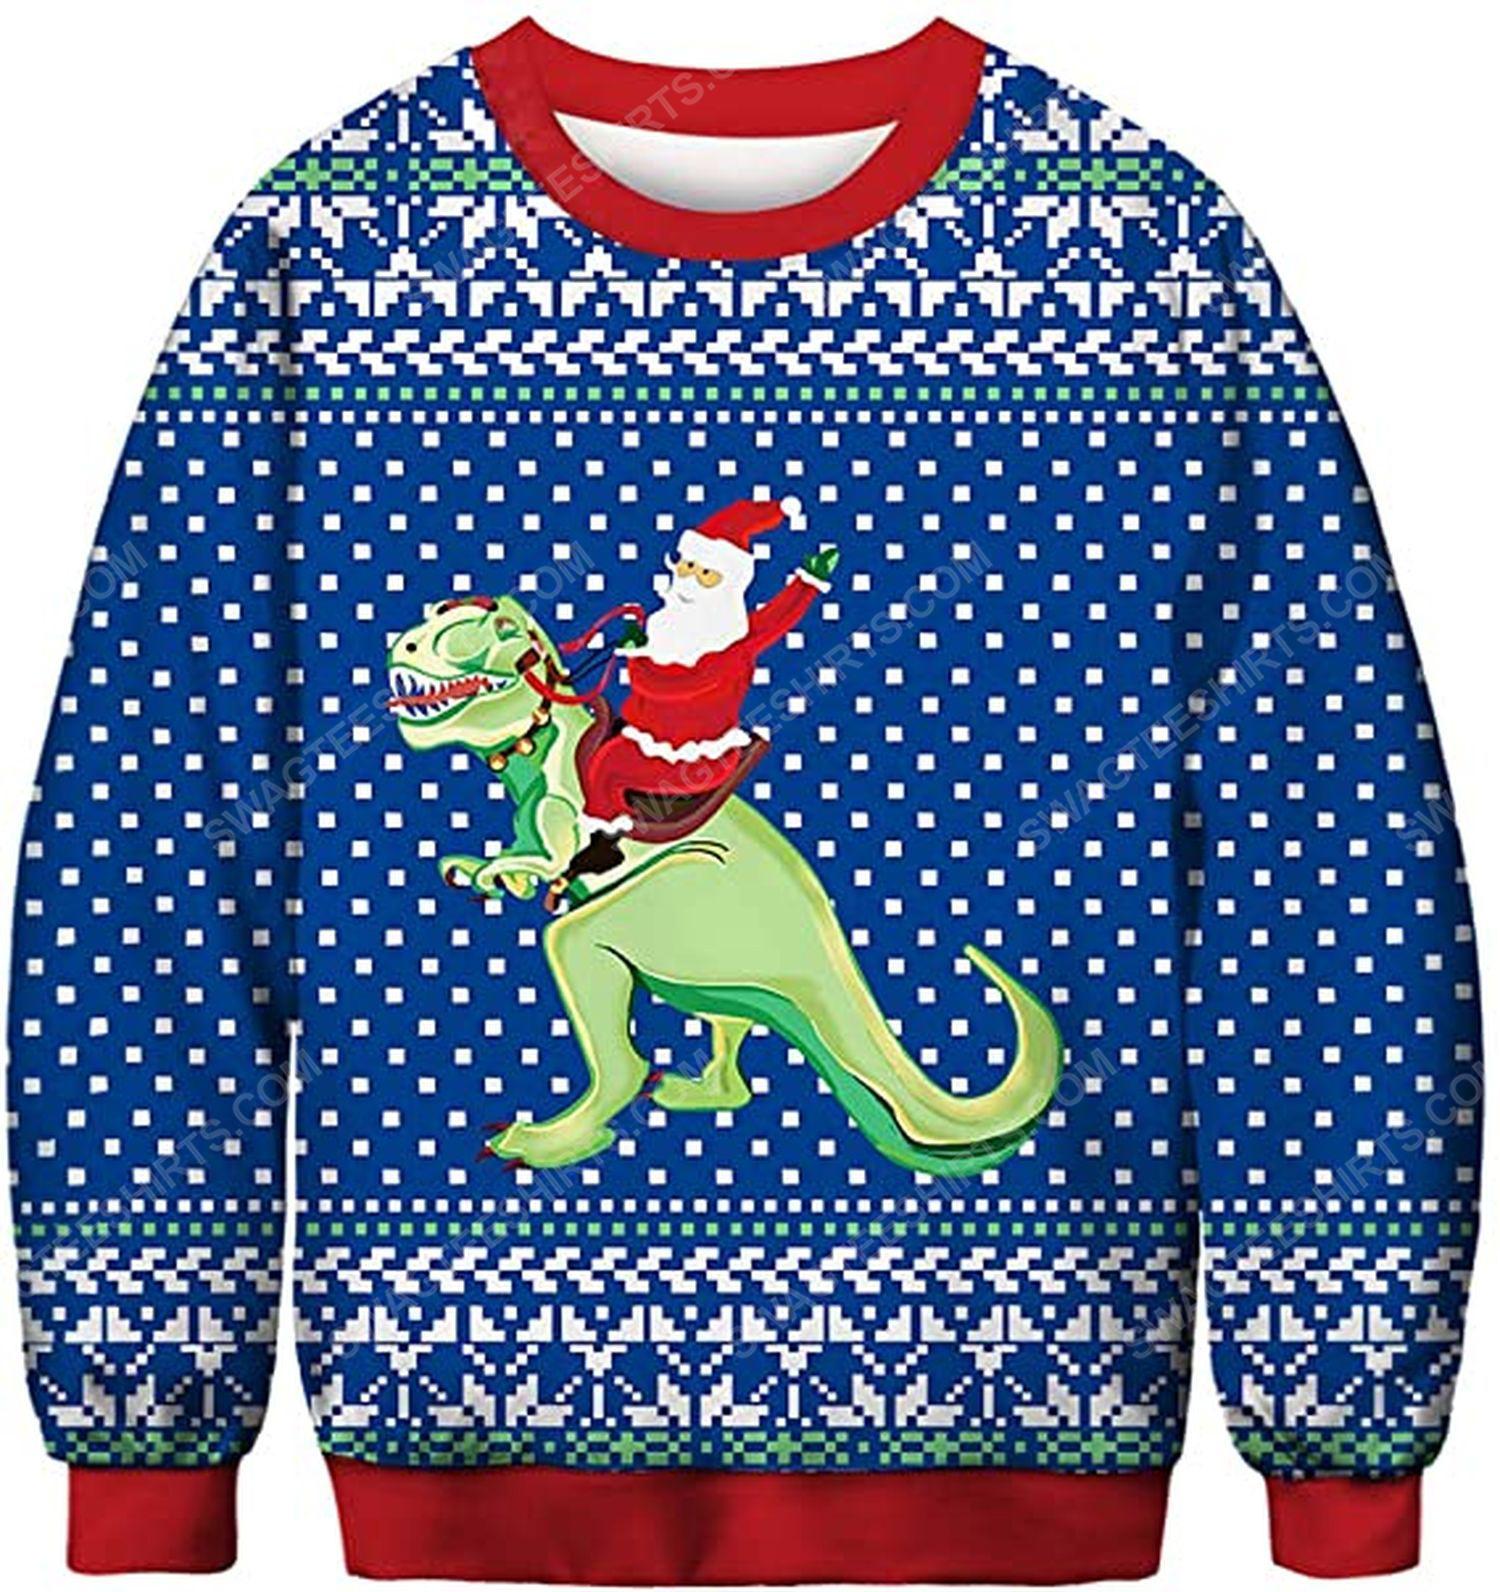 Santa claus riding a dinosaur full print ugly christmas sweater 2